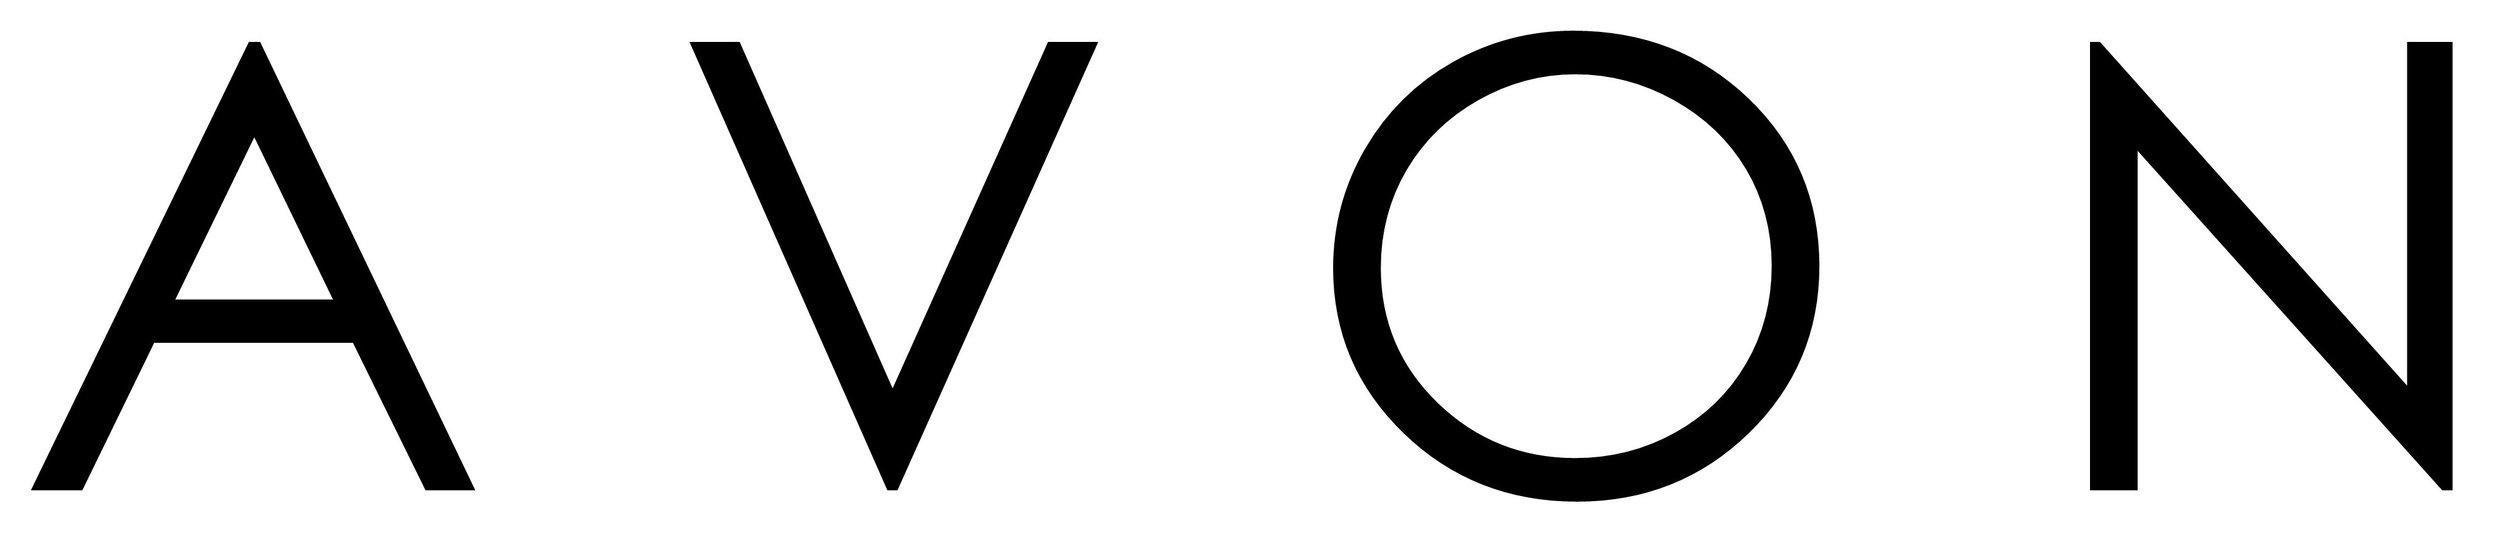 avon-logo.jpg